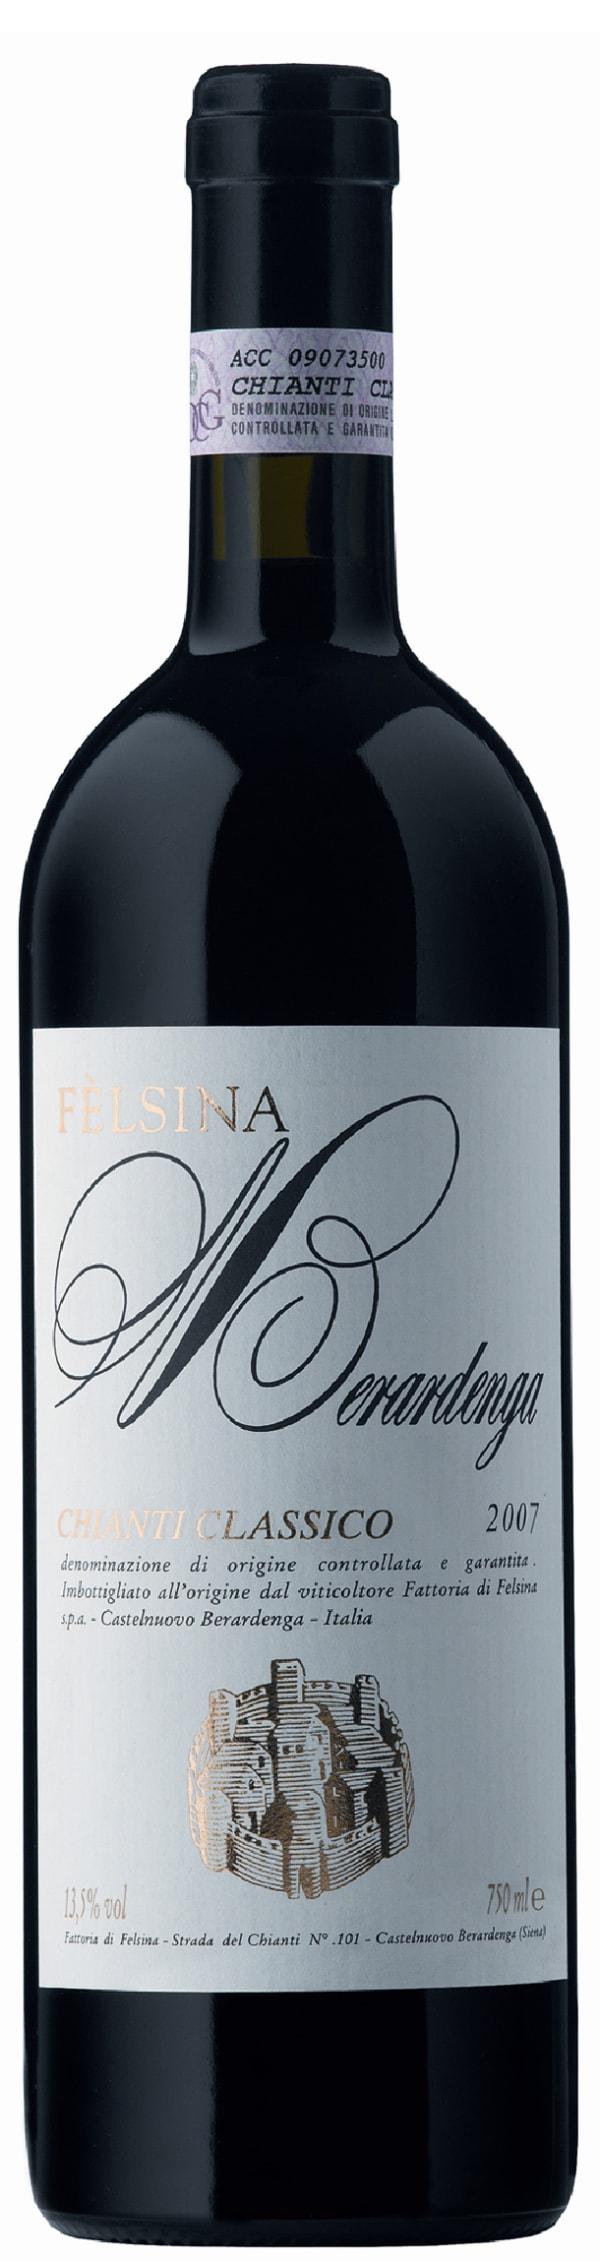 Fèlsina Berardenga Chianti Classico 2010